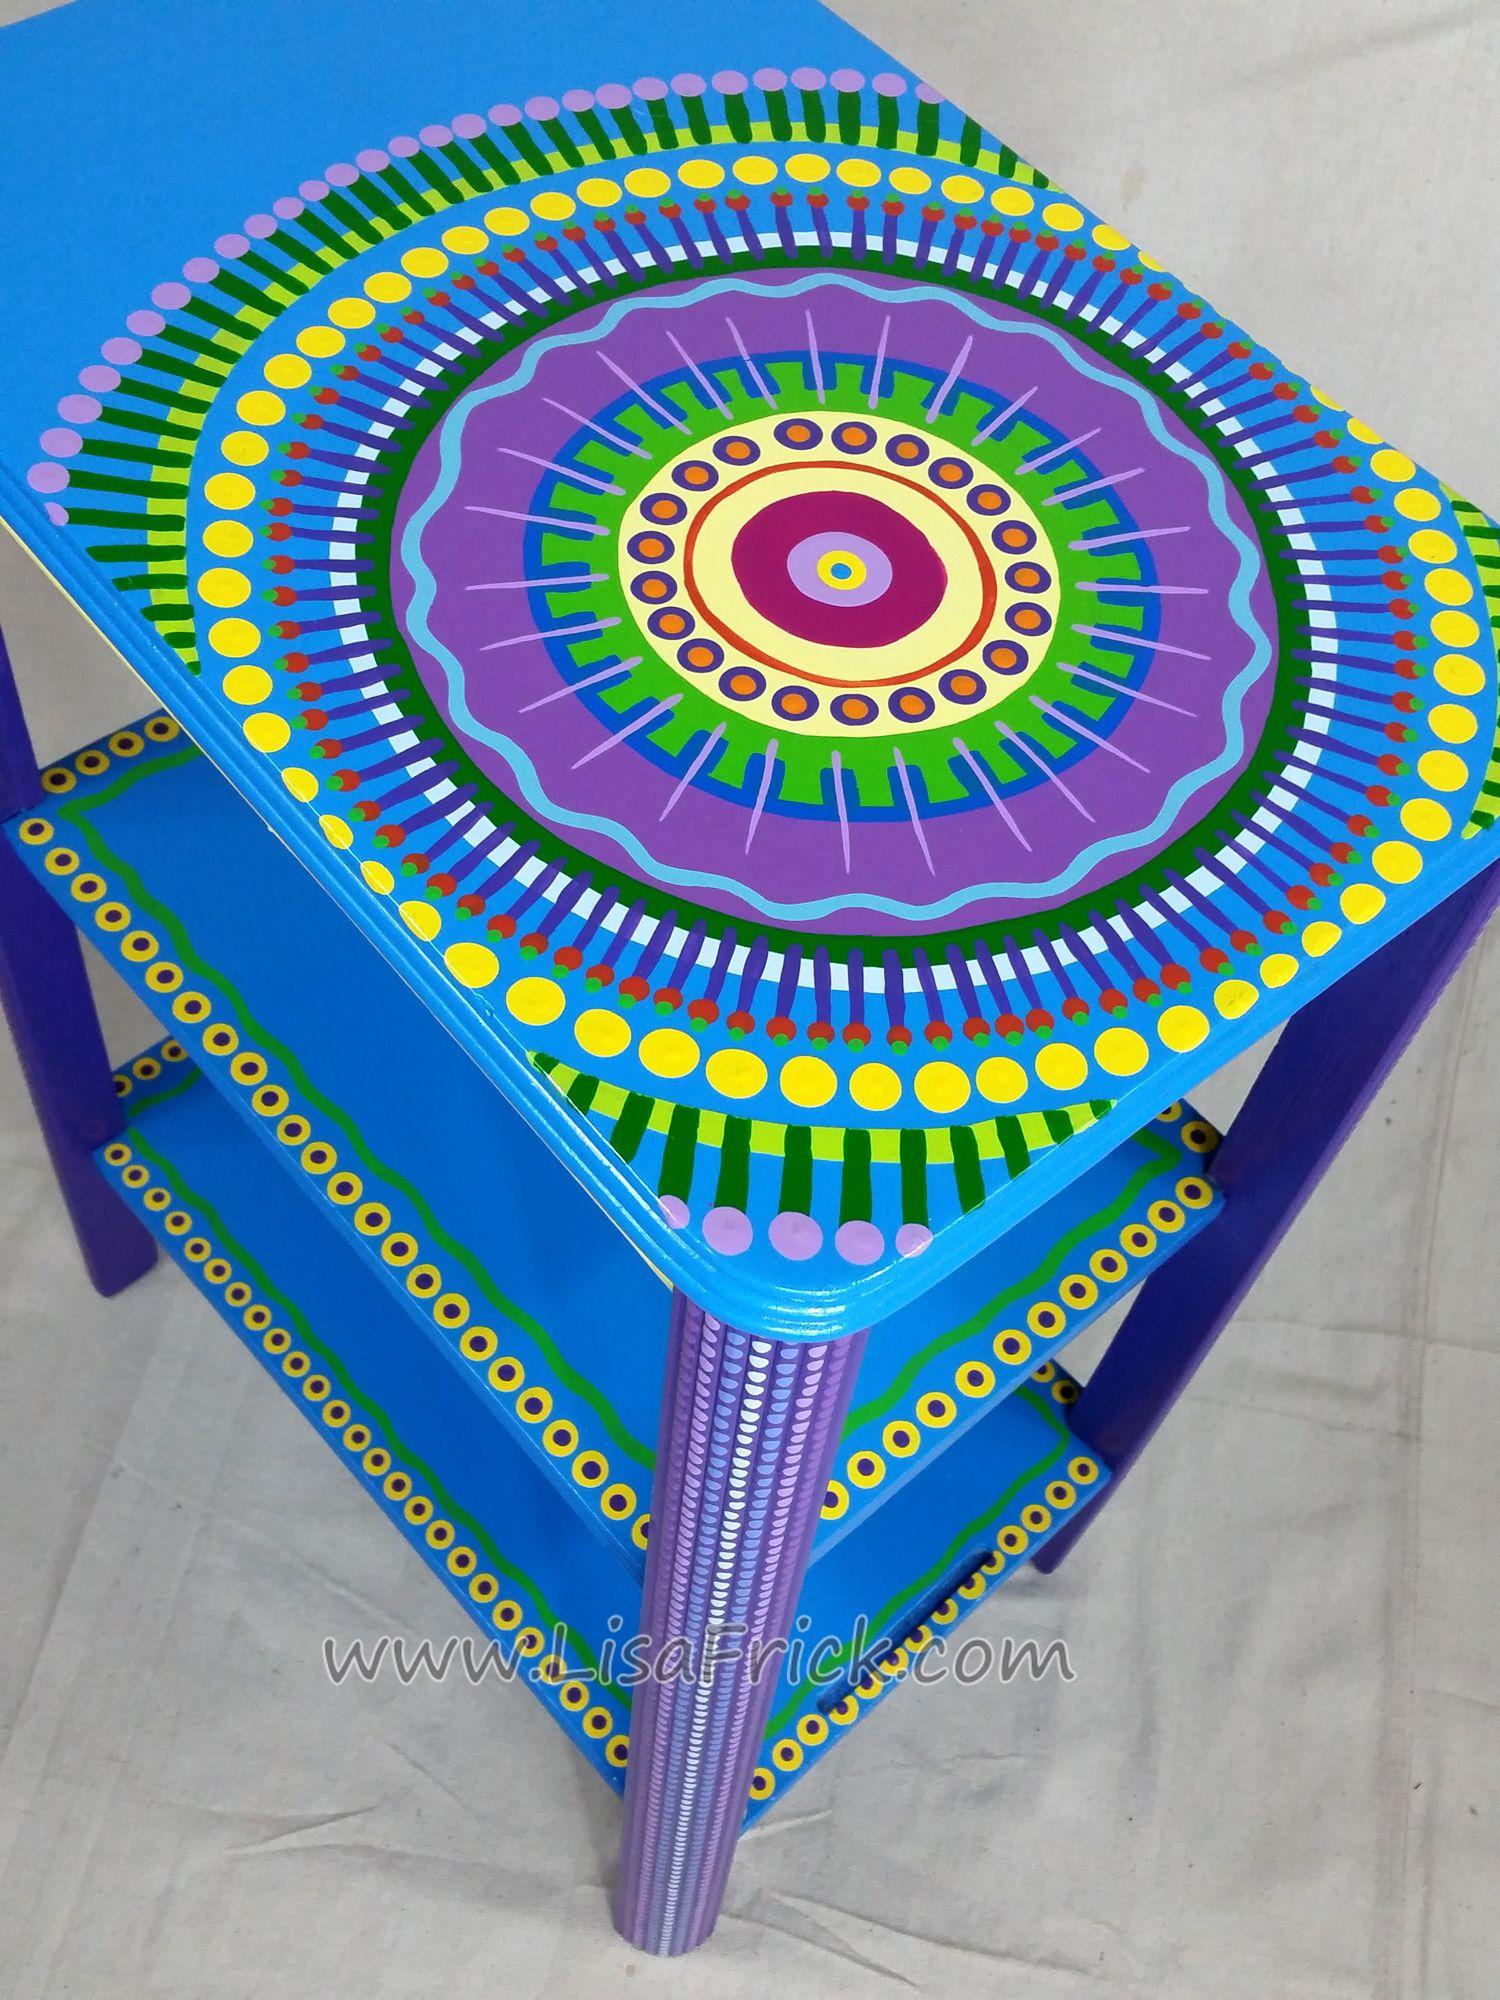 Blue Mandala up-cycled side table by Lisa Frick